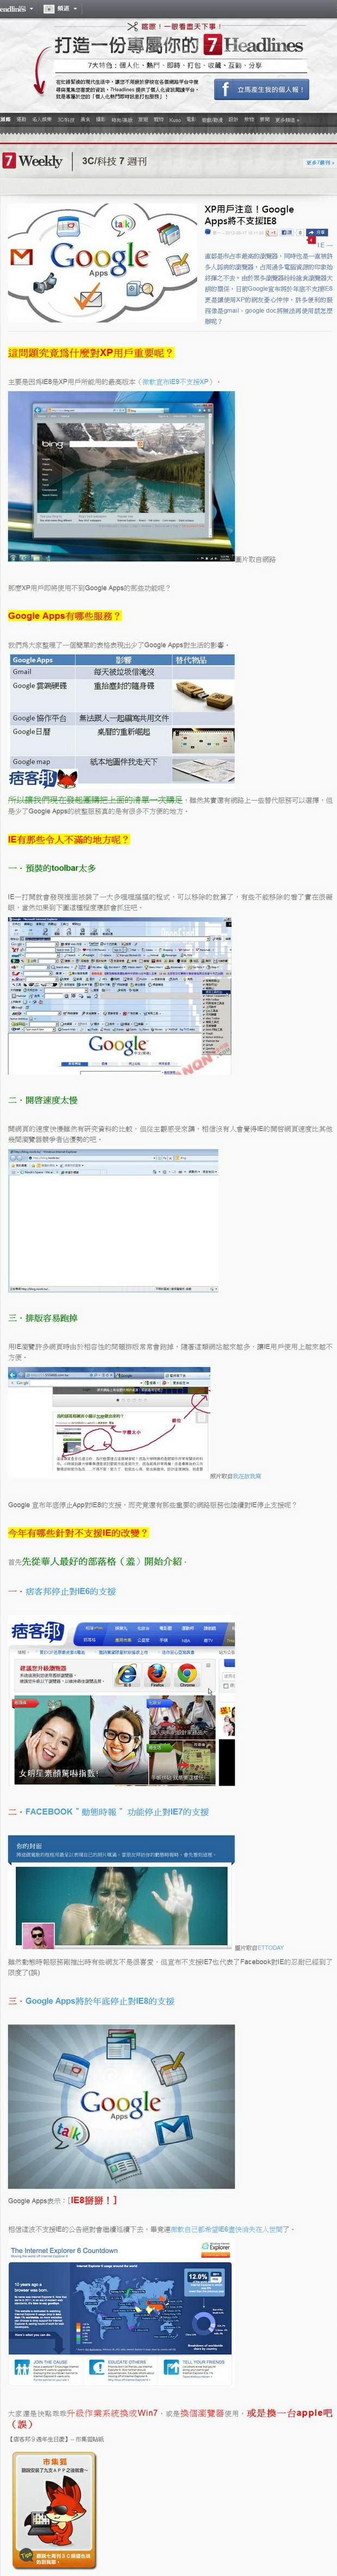 XP用戶注意!Google Apps將不支援IE8-2012.09.17